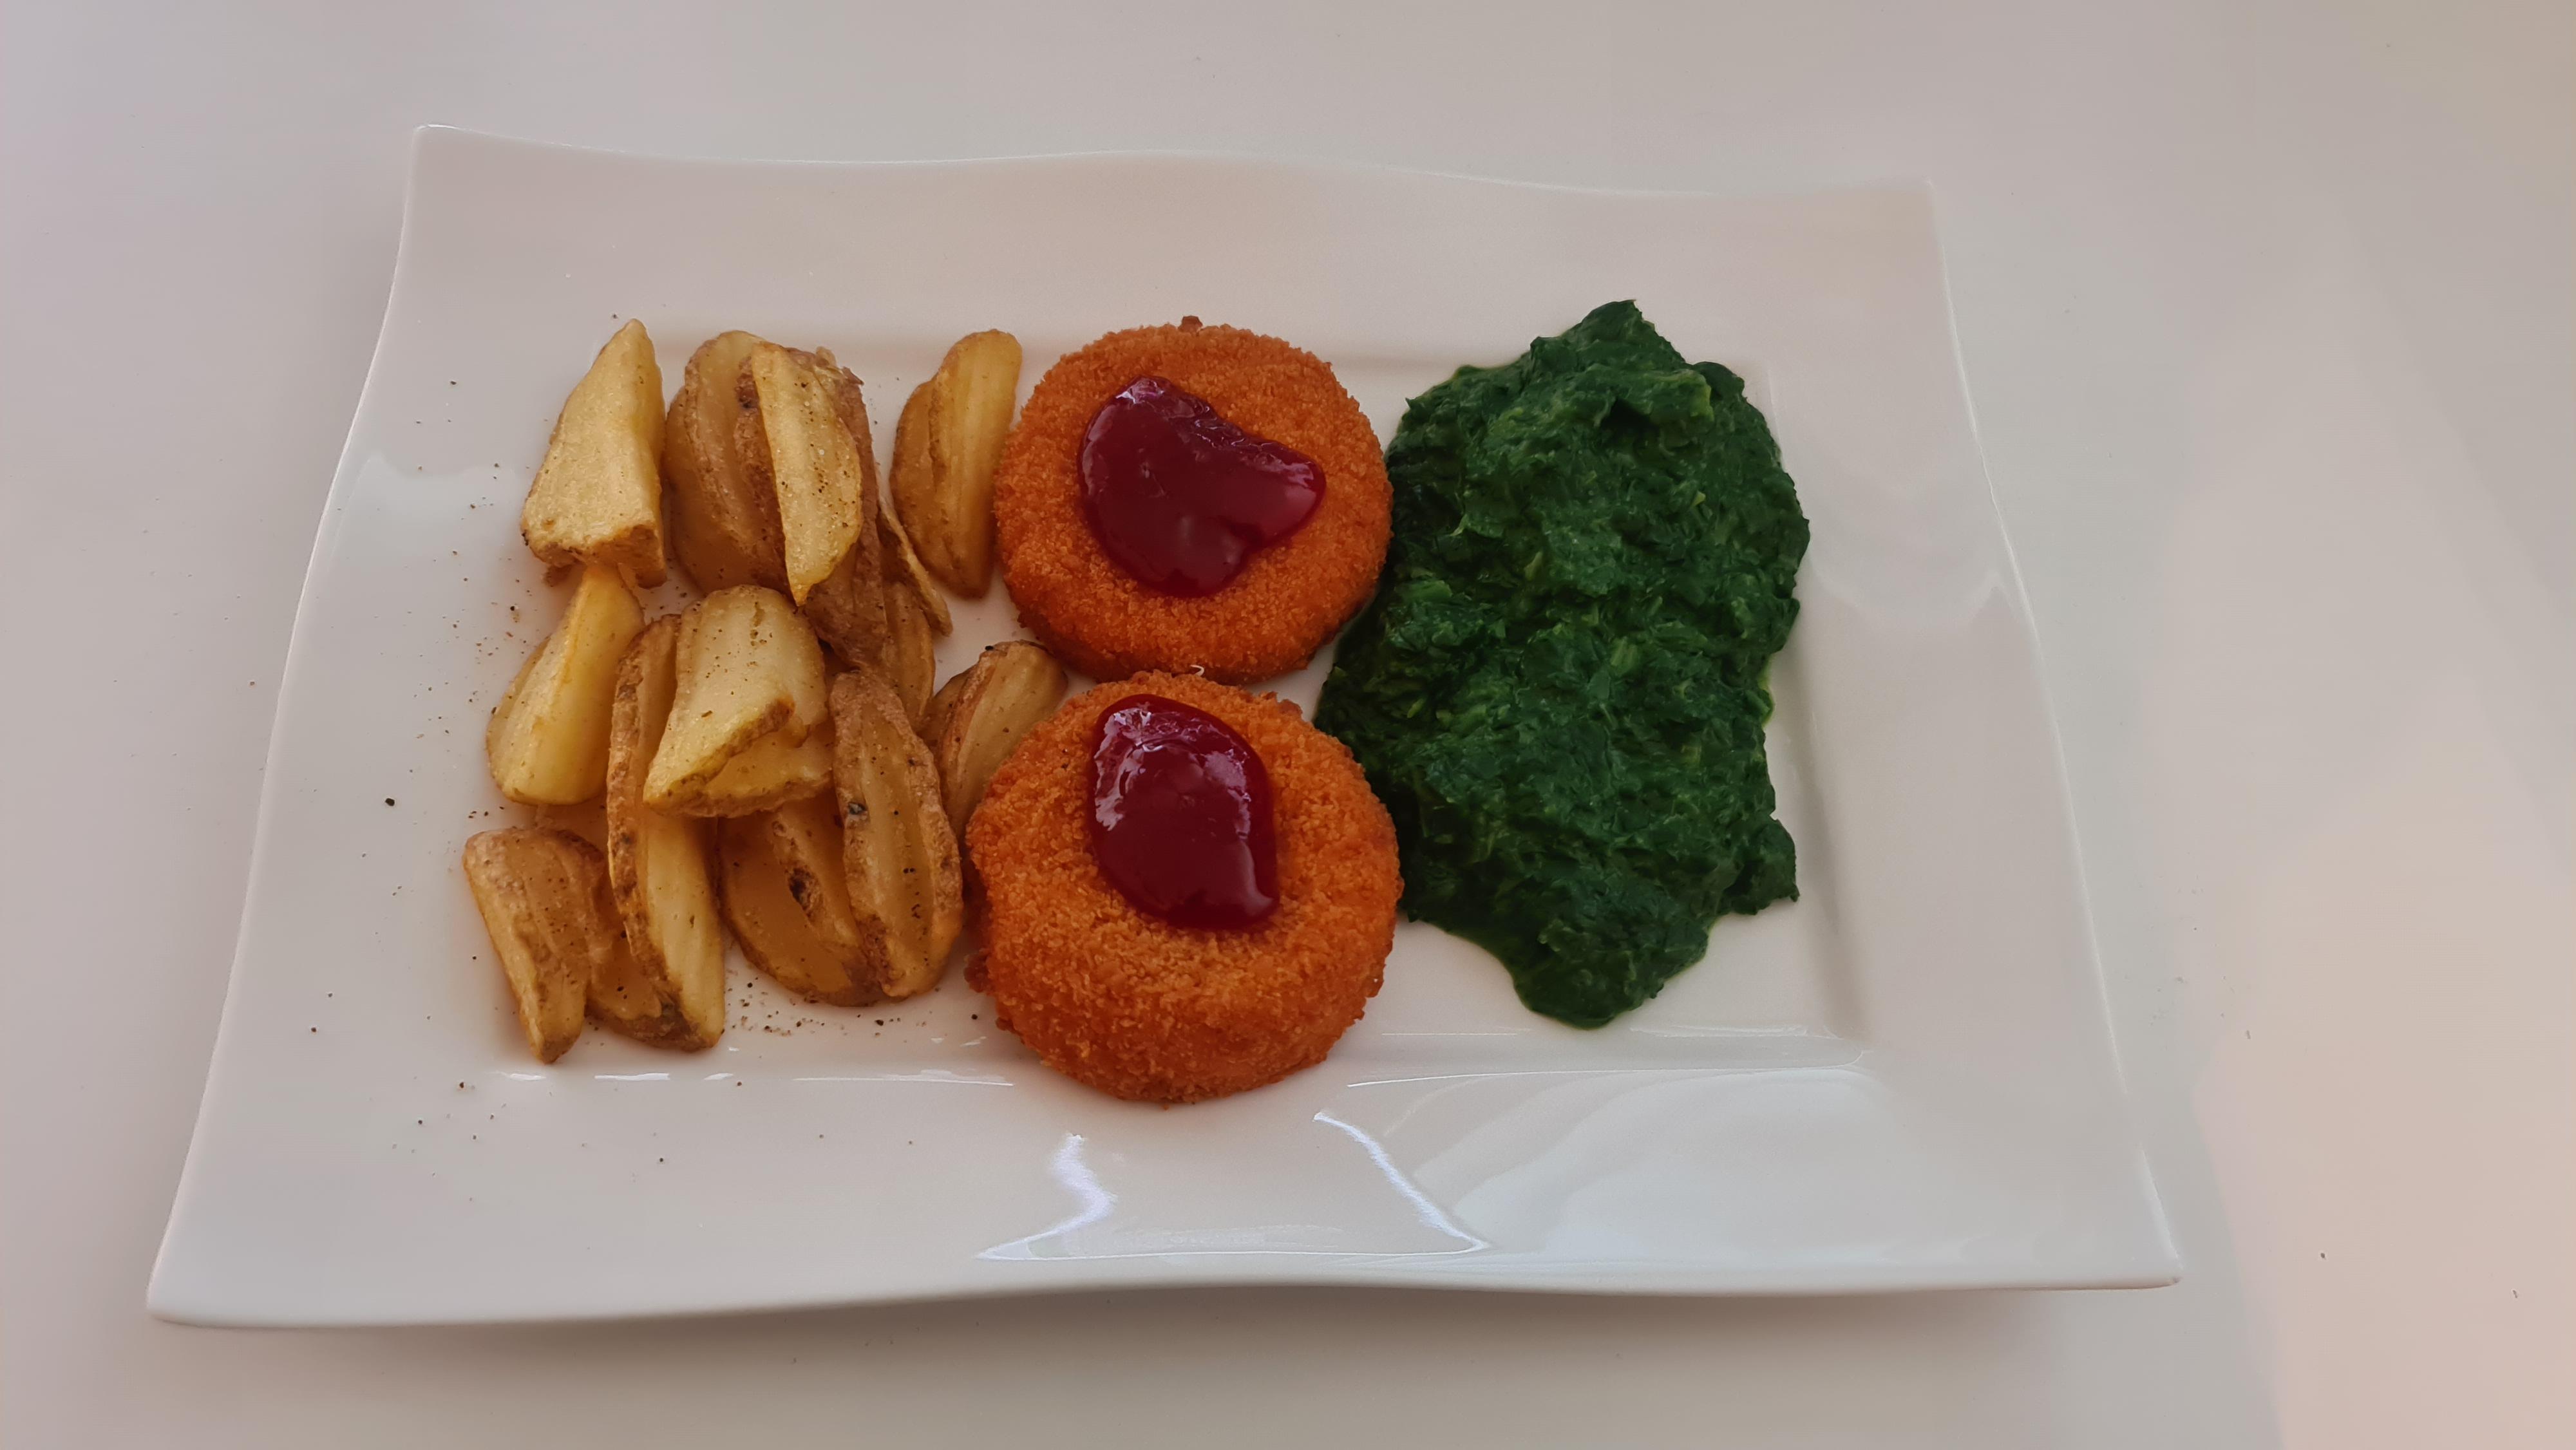 https://foodloader.net/Holz_2020-06-11_Gebackener_Camembert_mit_Spinat_und_Crispers.jpg